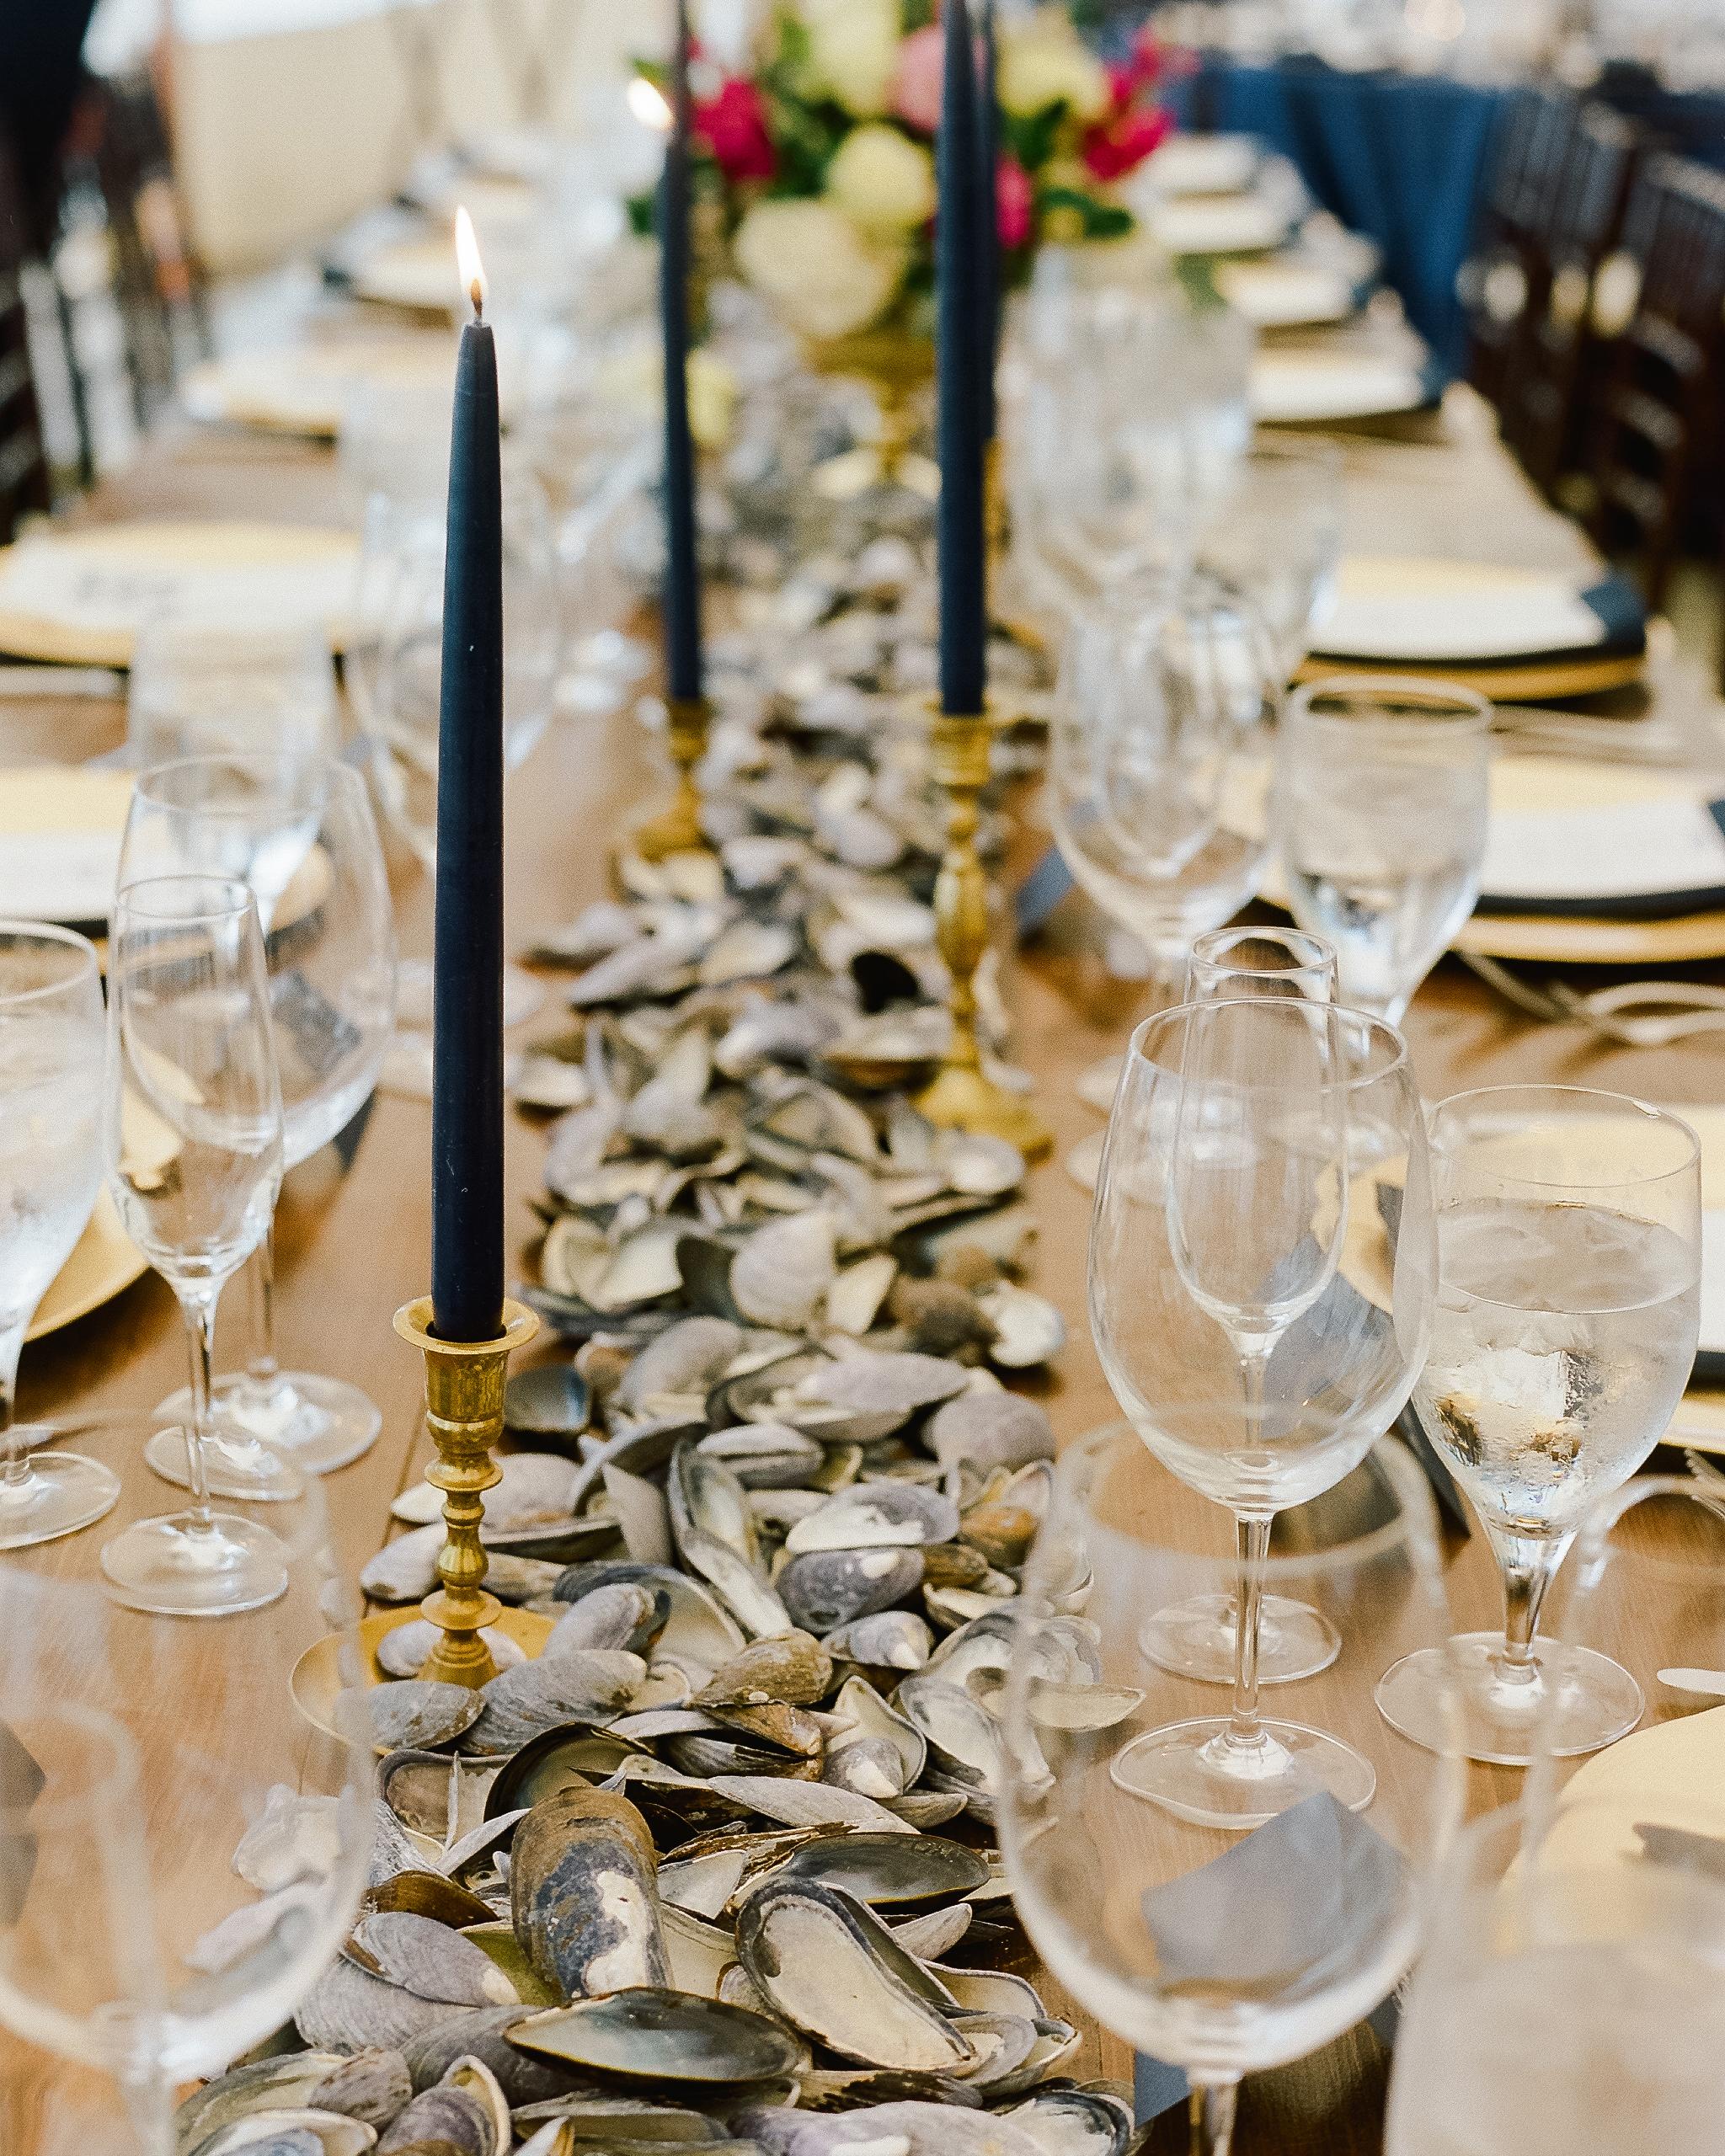 lindsay-garrett-wedding-table-0755-s111850-0415.jpg